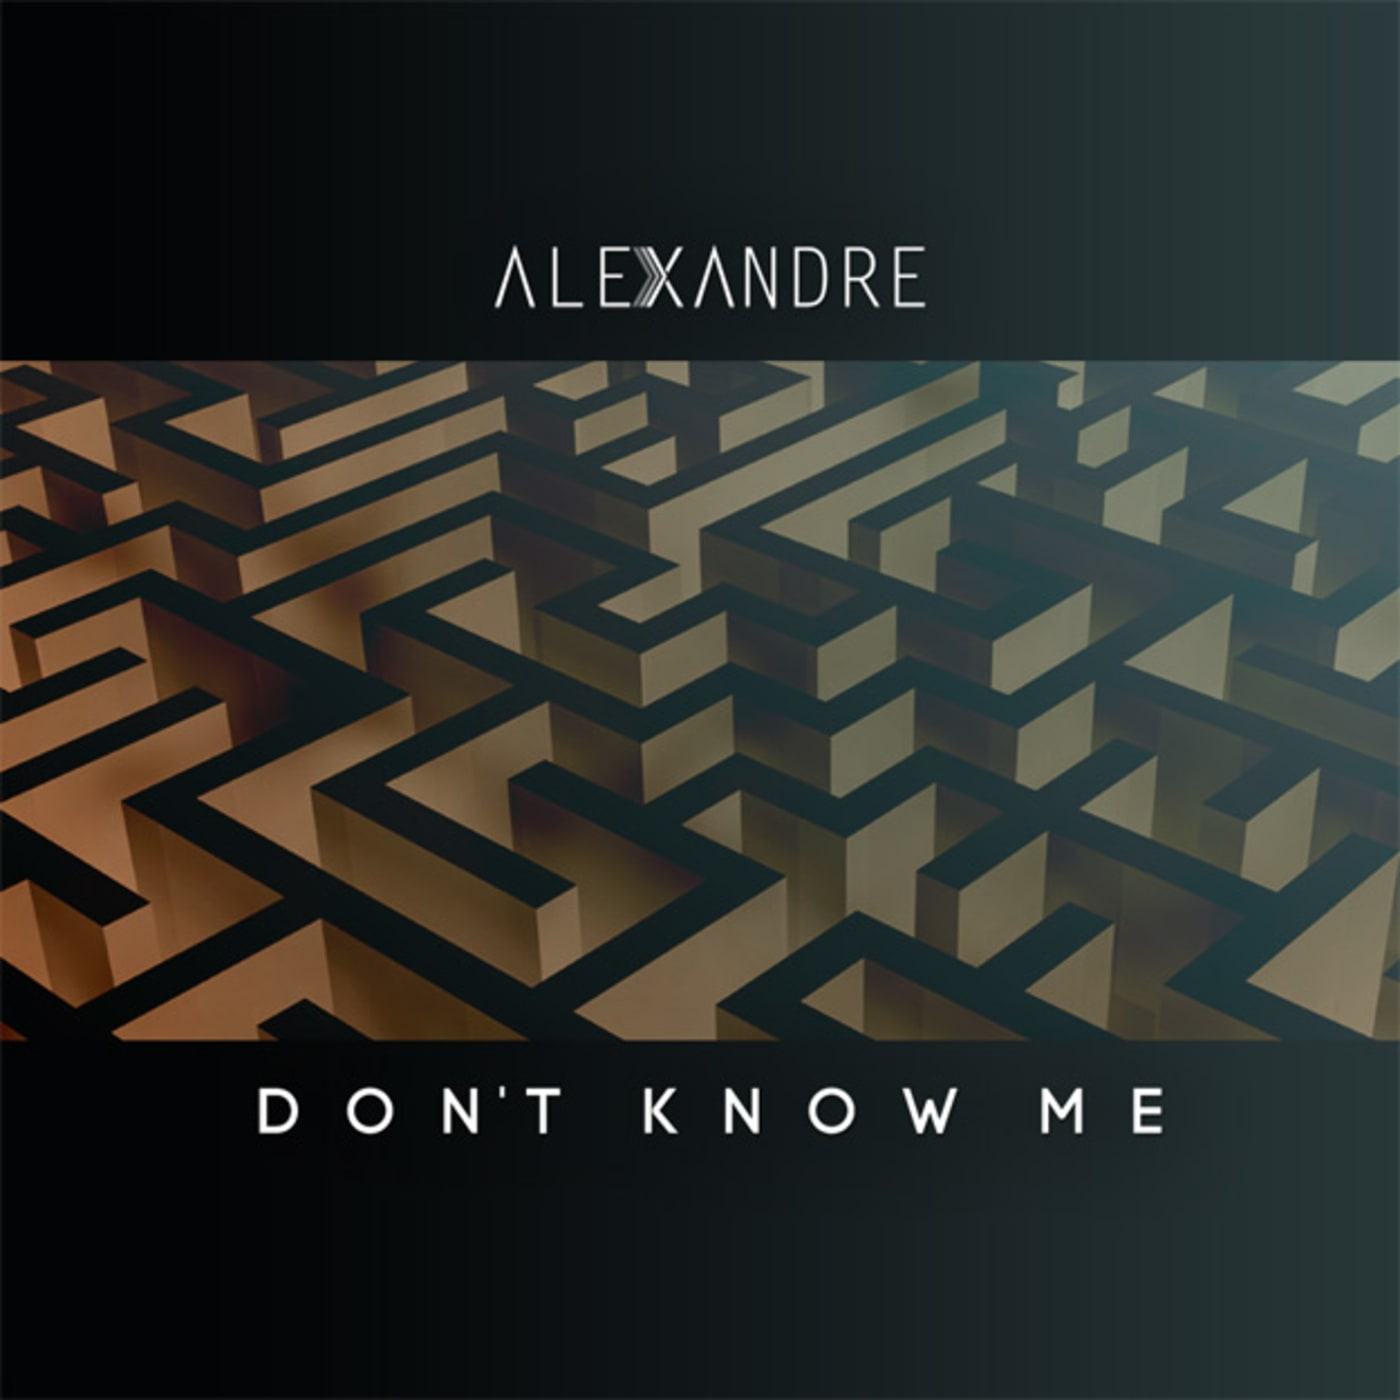 alexandre dont know me